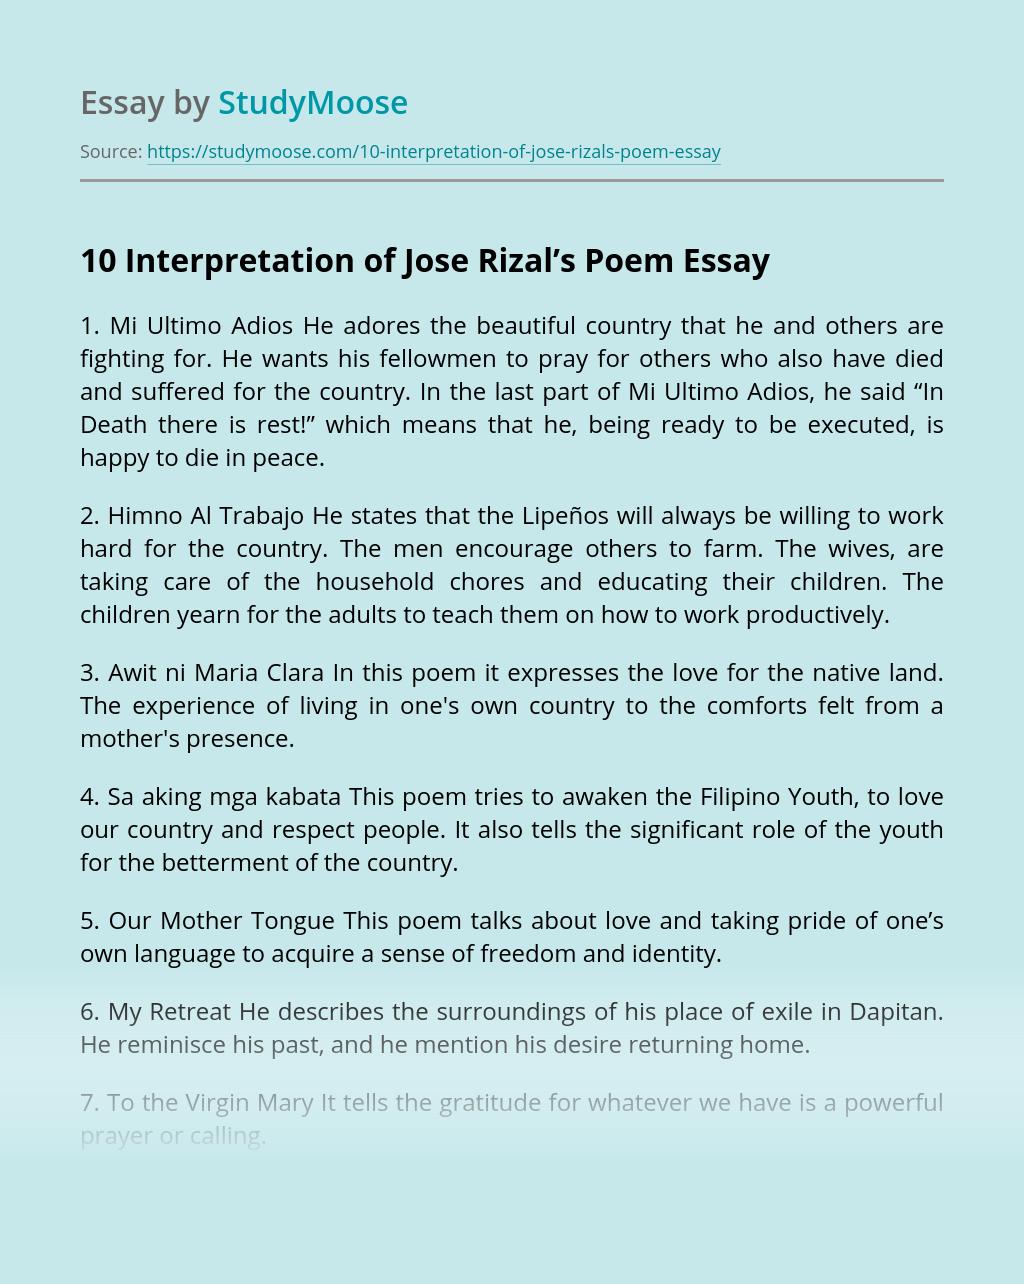 10 Interpretation of Jose Rizal's Poem